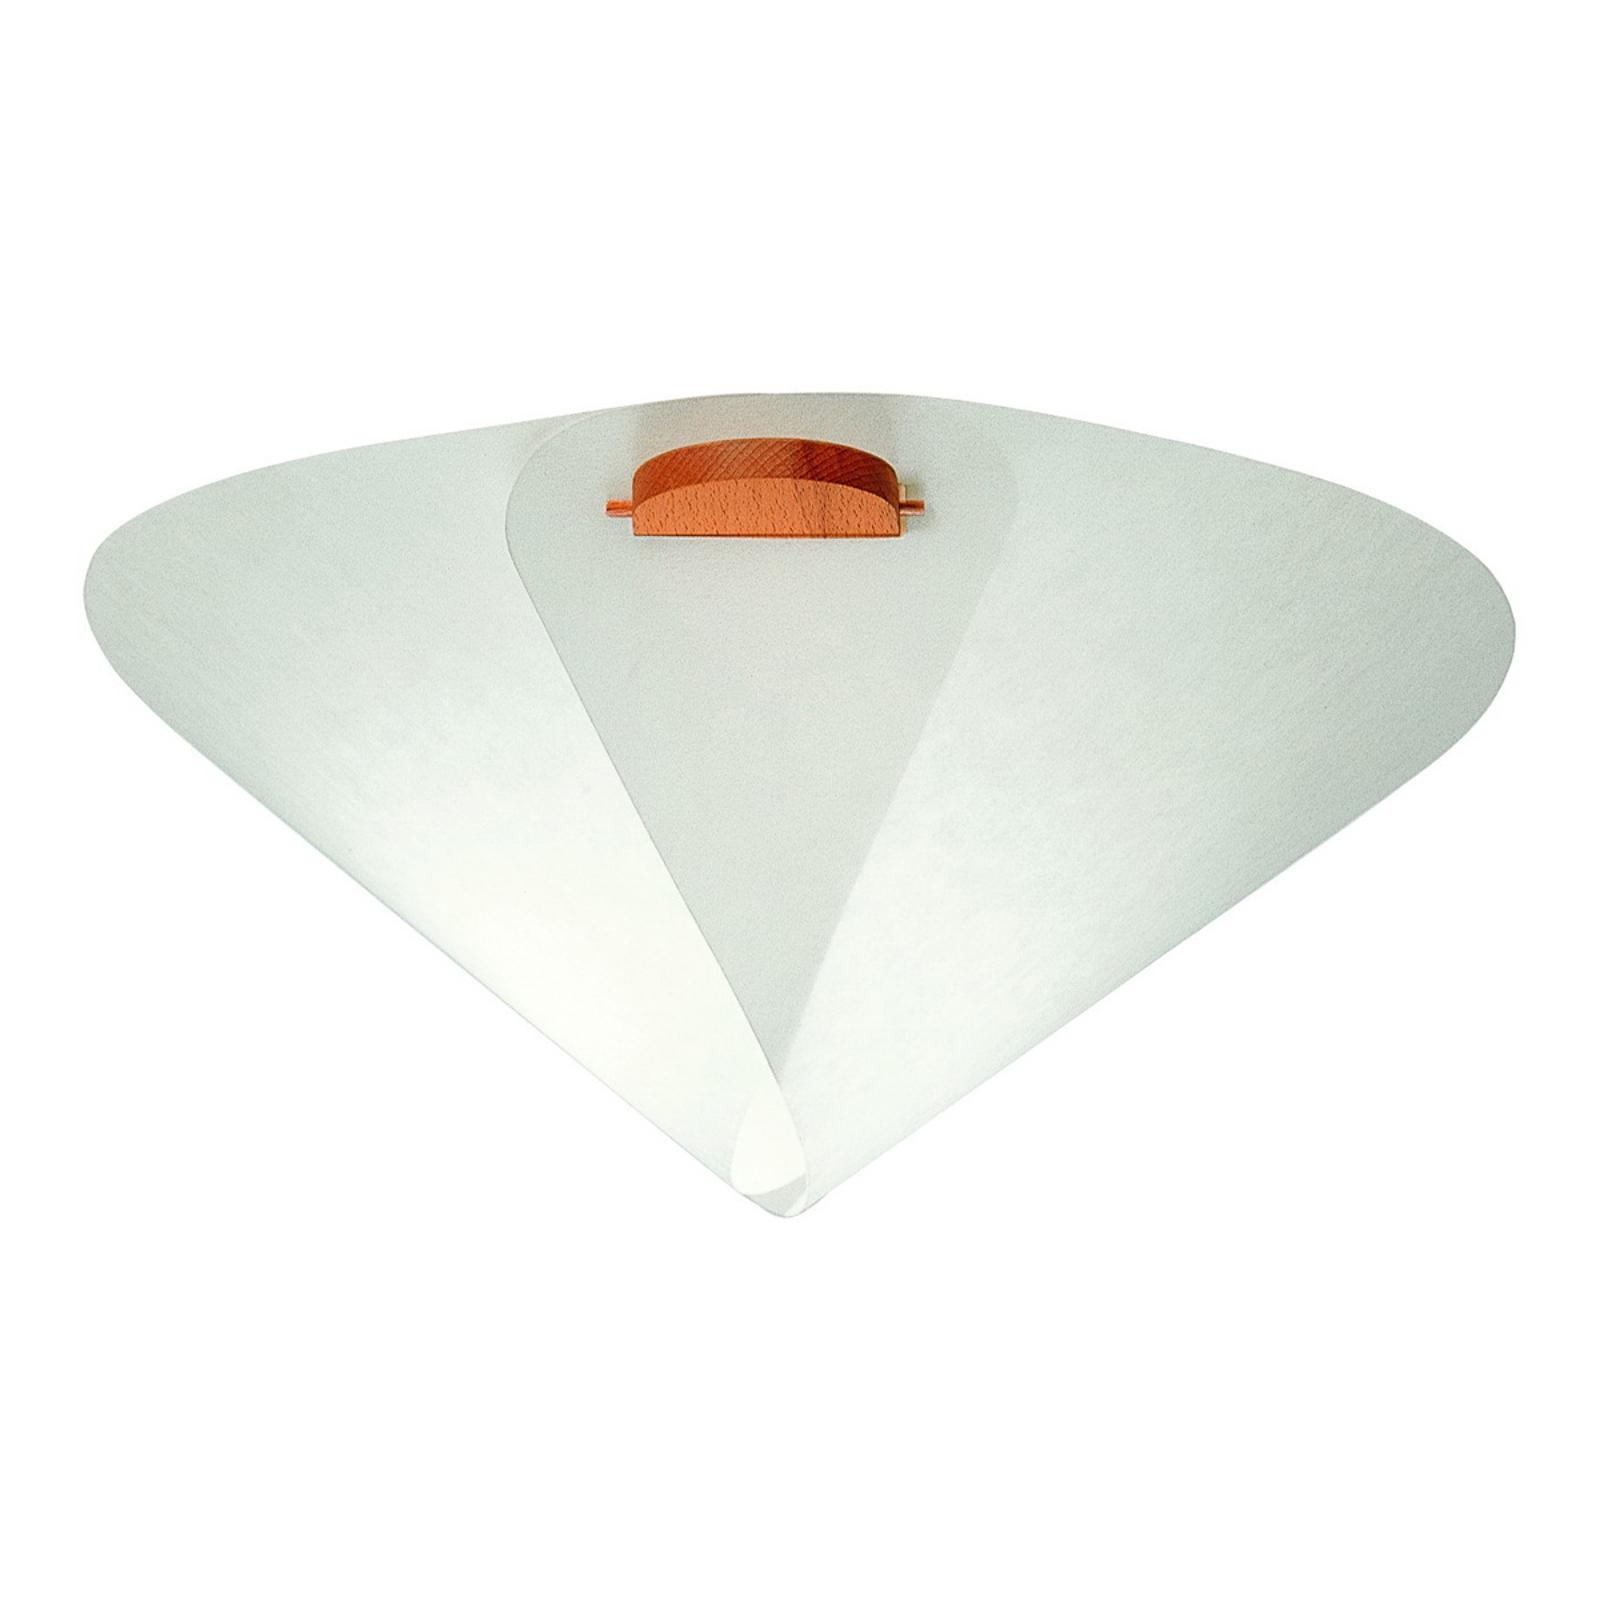 Kjegleformet IRIS designertaklampe